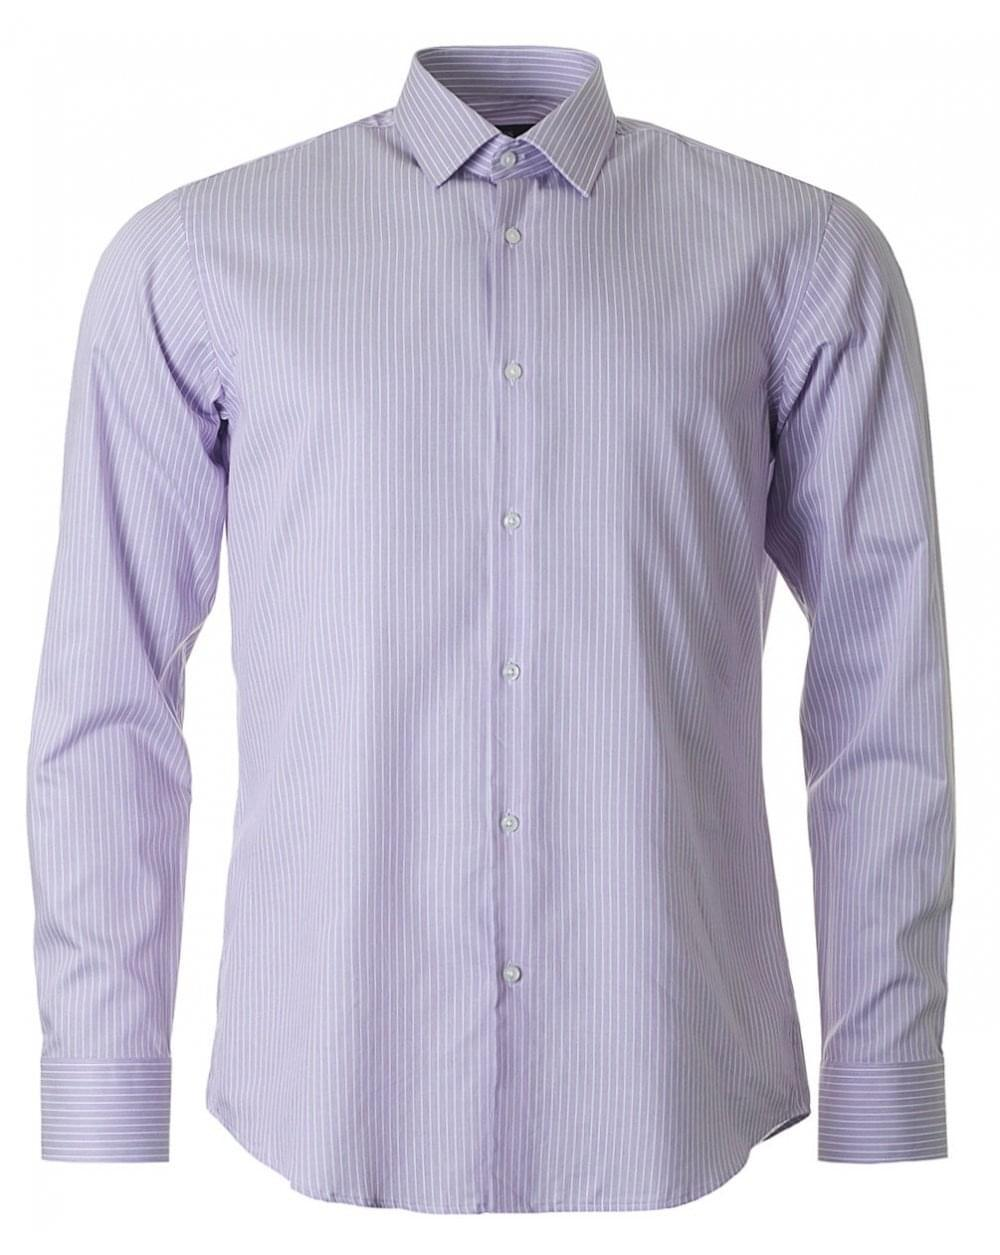 8710fa118 Lyst - BOSS Enzo Regular Fit Striped Shirt in Purple for Men